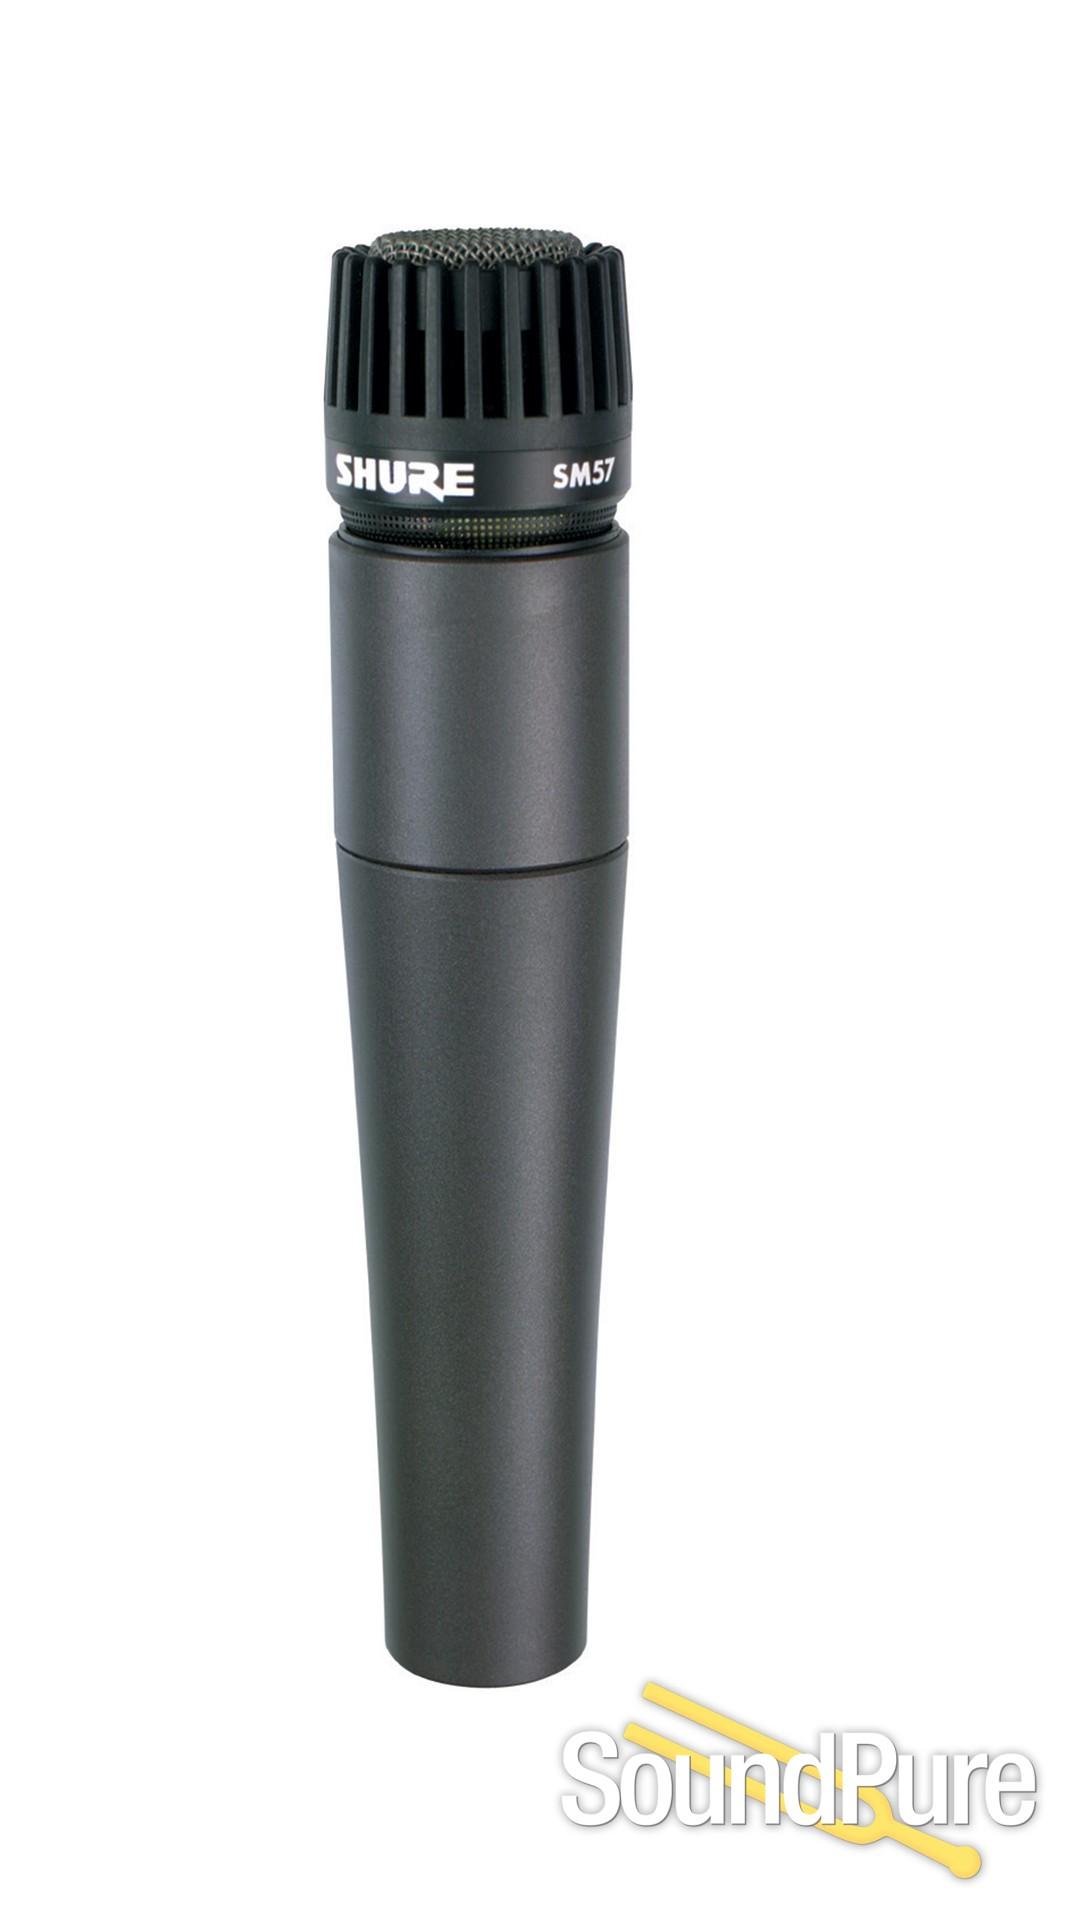 Shure Sm58 Wiring Diagram Shure Sm57 Instrument Microphone Of Shure Sm58 Wiring Diagram